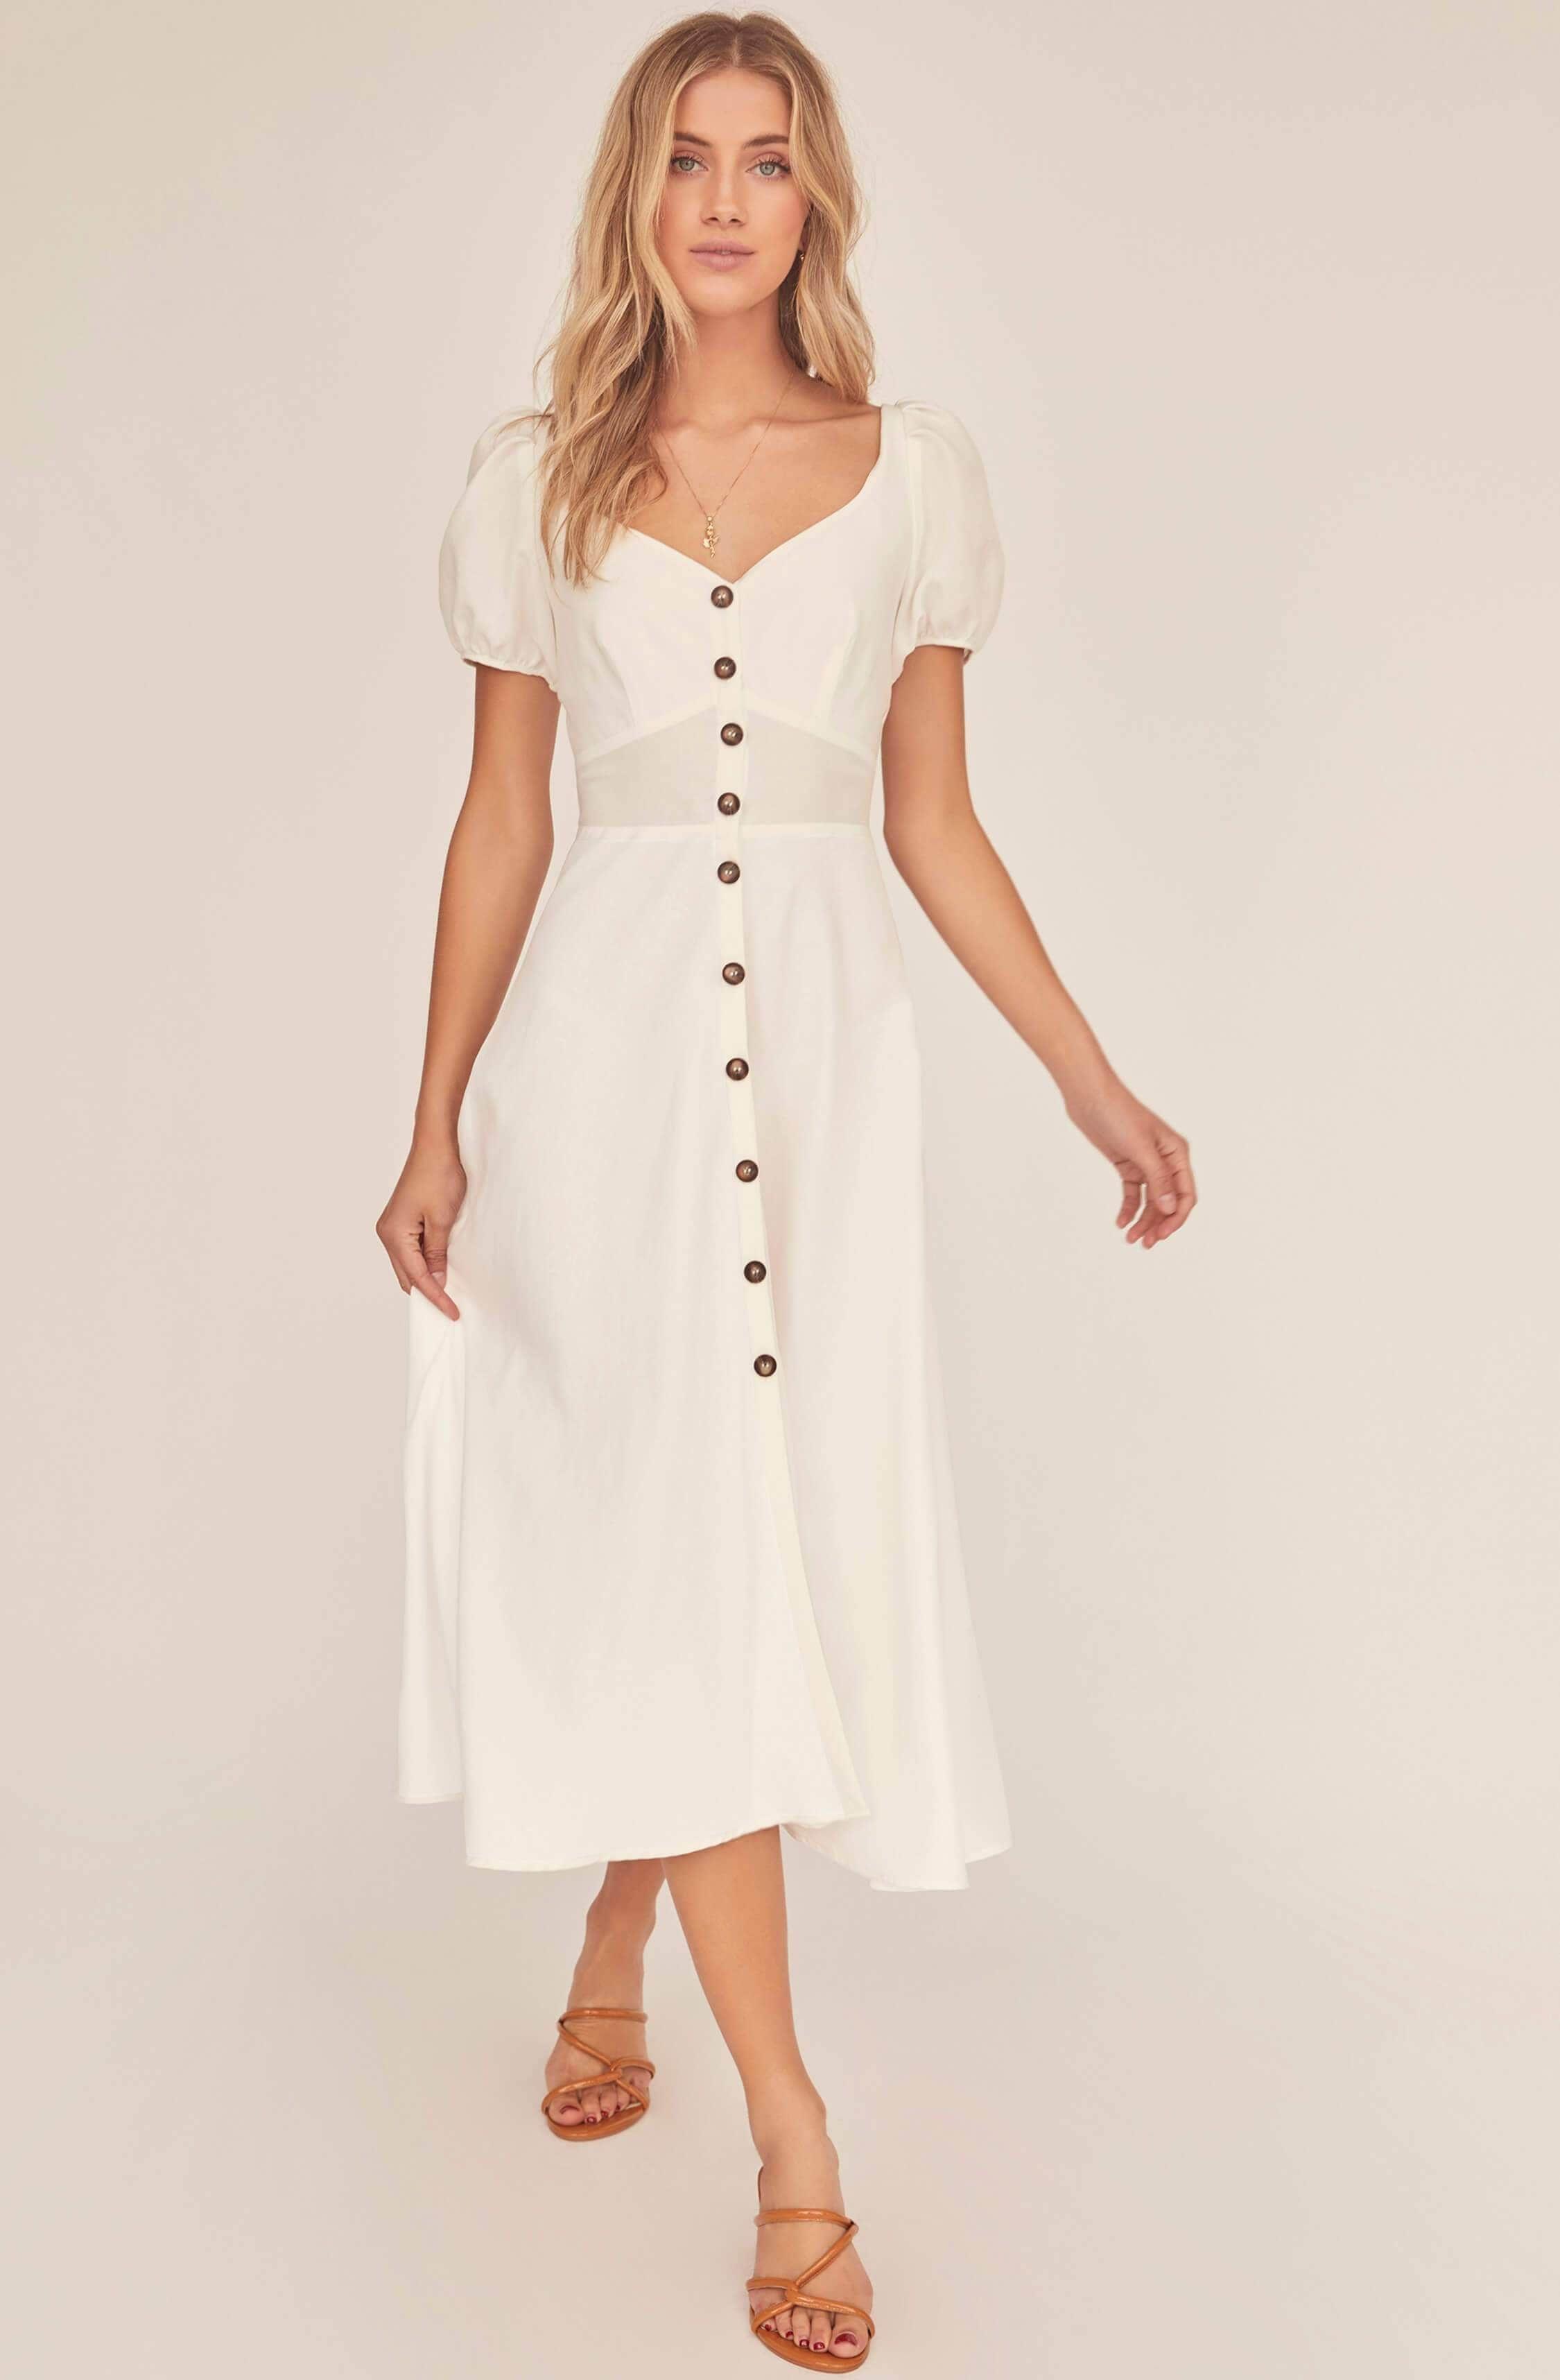 Pippa Midi Dress In 2021 White Short Sleeve Dress Elegant Midi Dresses Midi Dress [ 3432 x 2250 Pixel ]